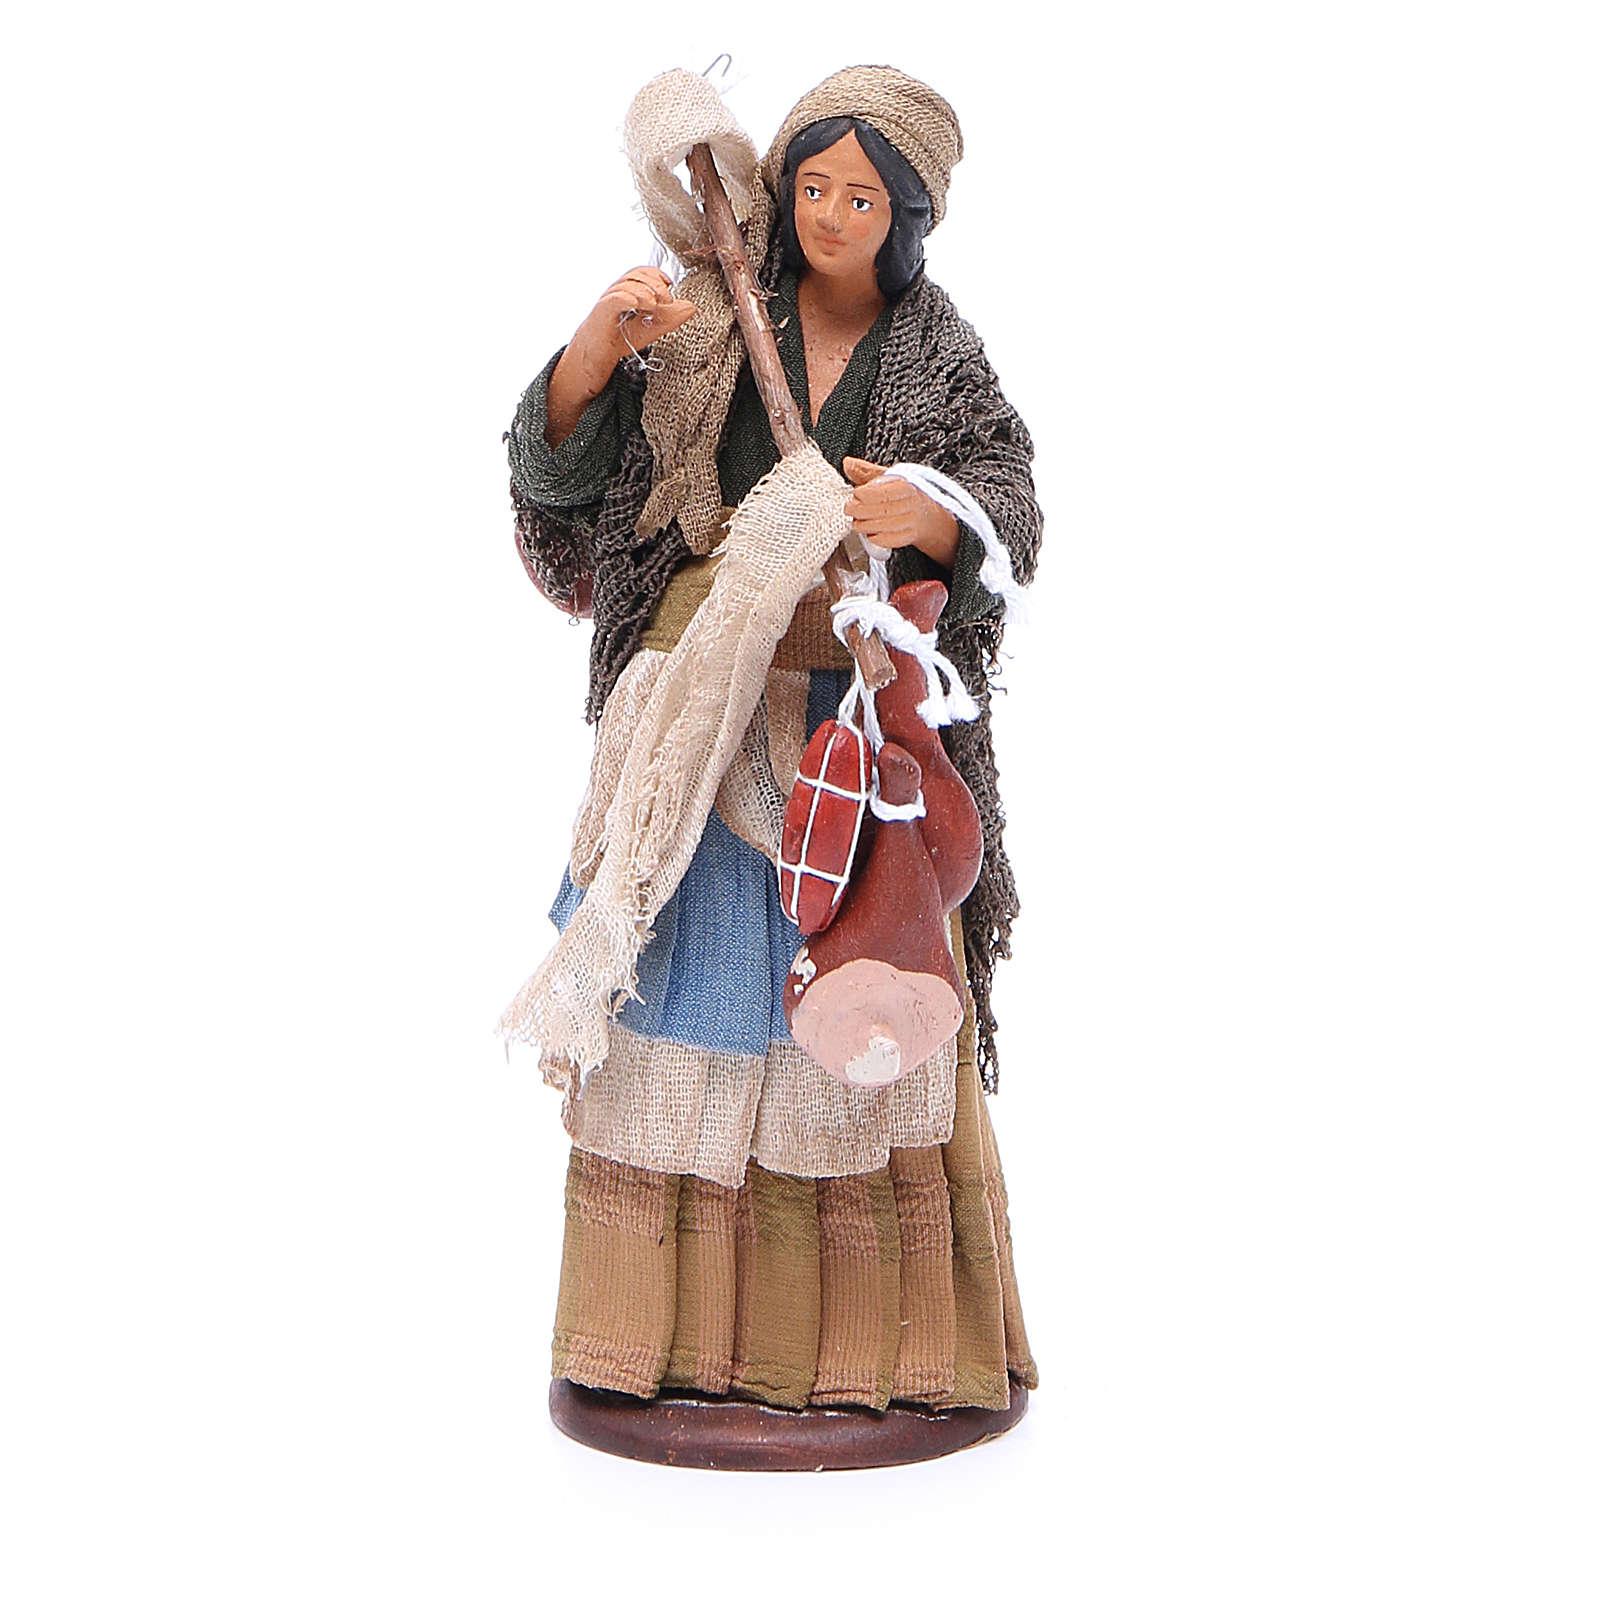 Wayfarer woman with cured meats for Neapolitan Nativity, 14cm 4